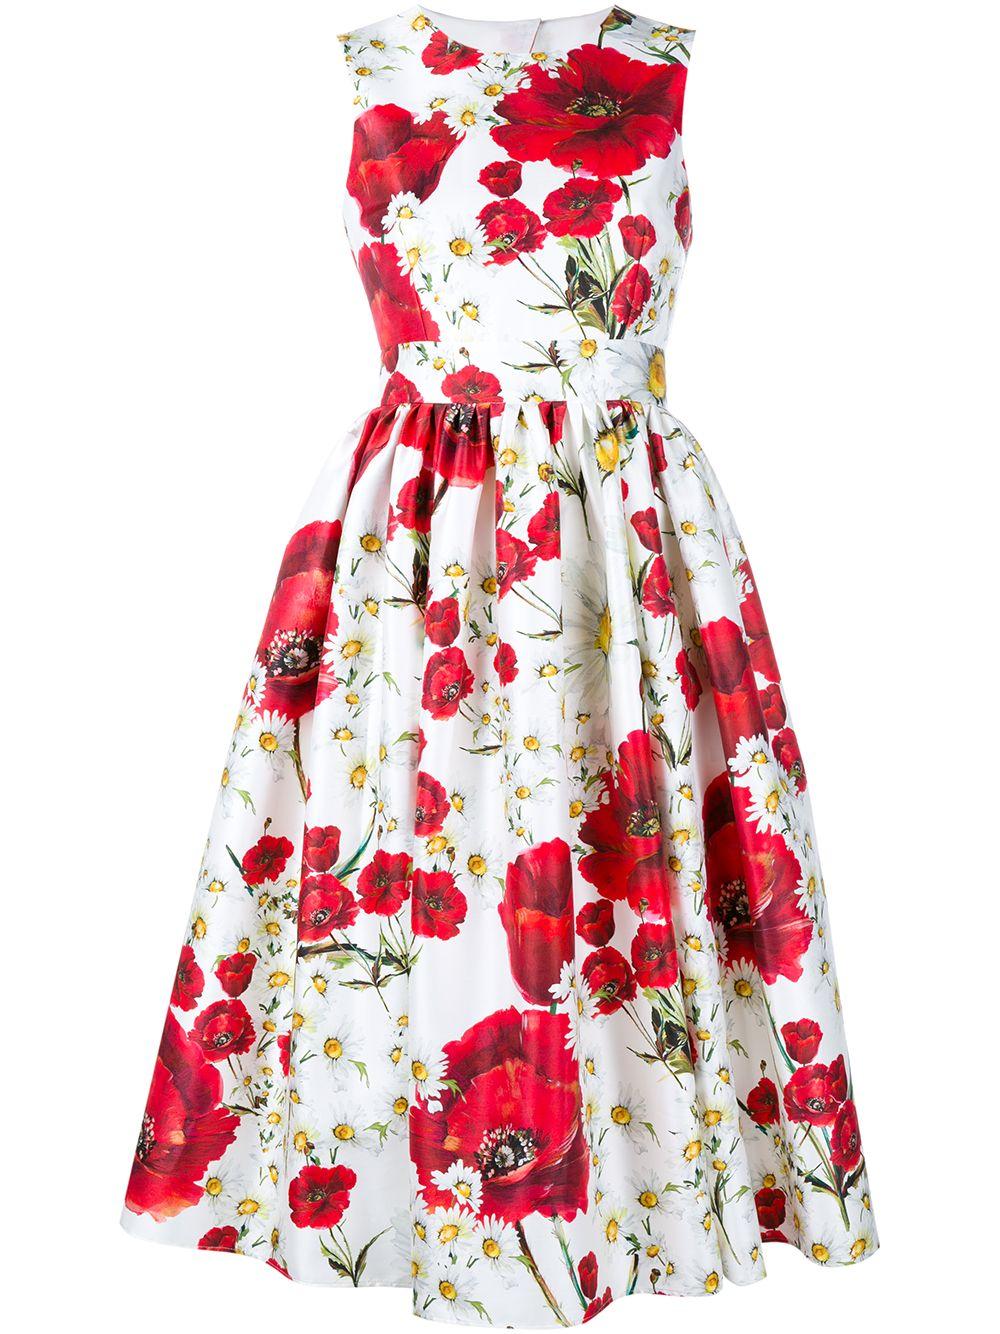 Sleeveless Floral Print Cotton-Silk Dress